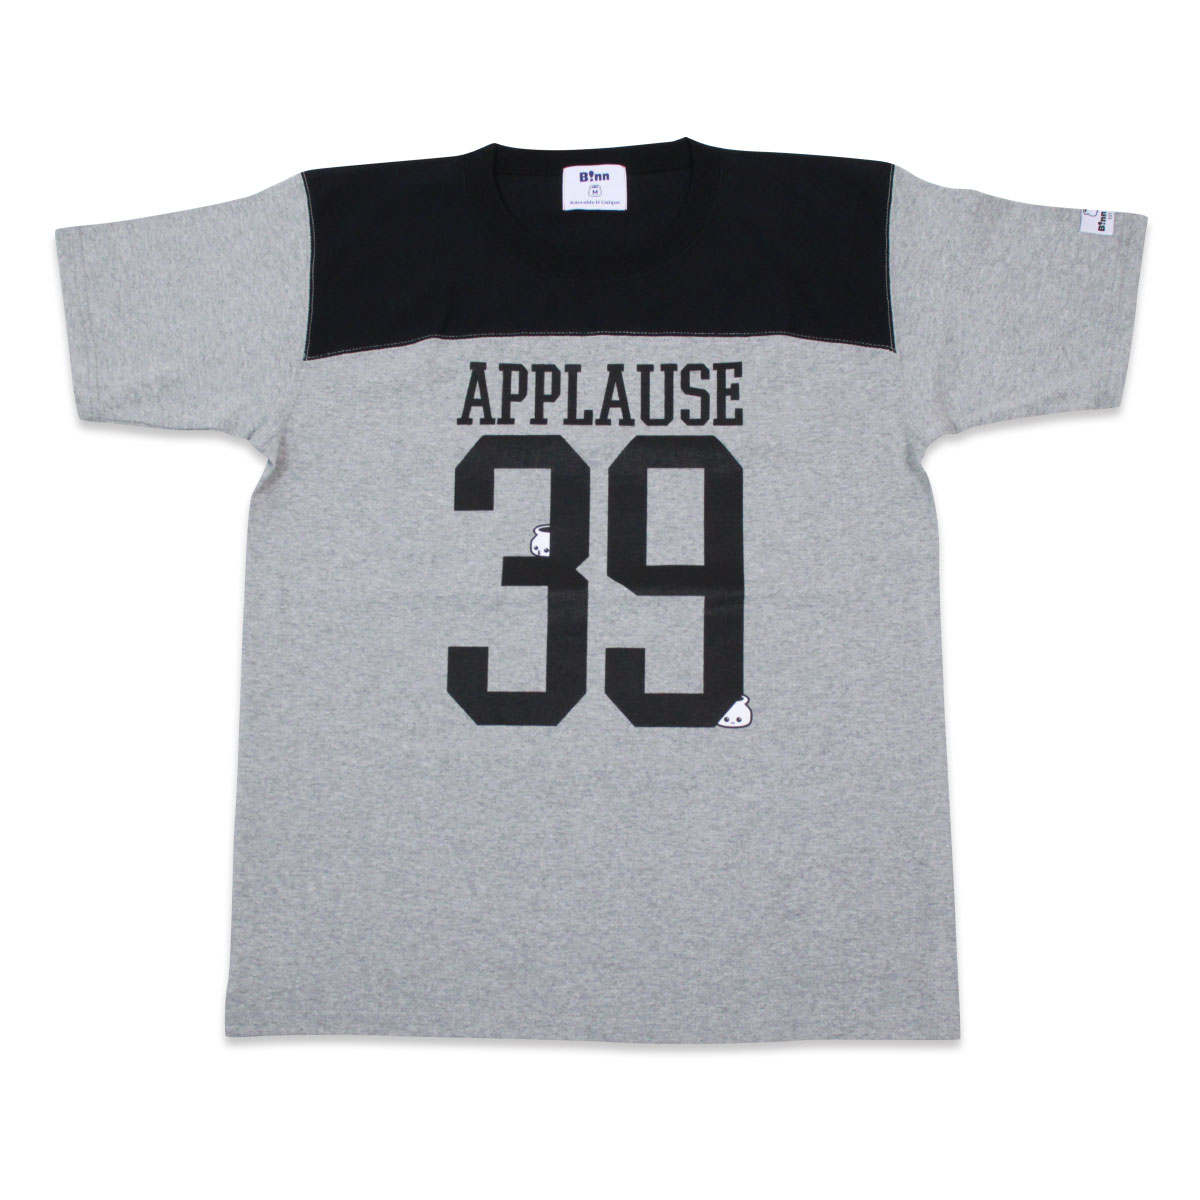 applause フットボールT(Grey x Black)